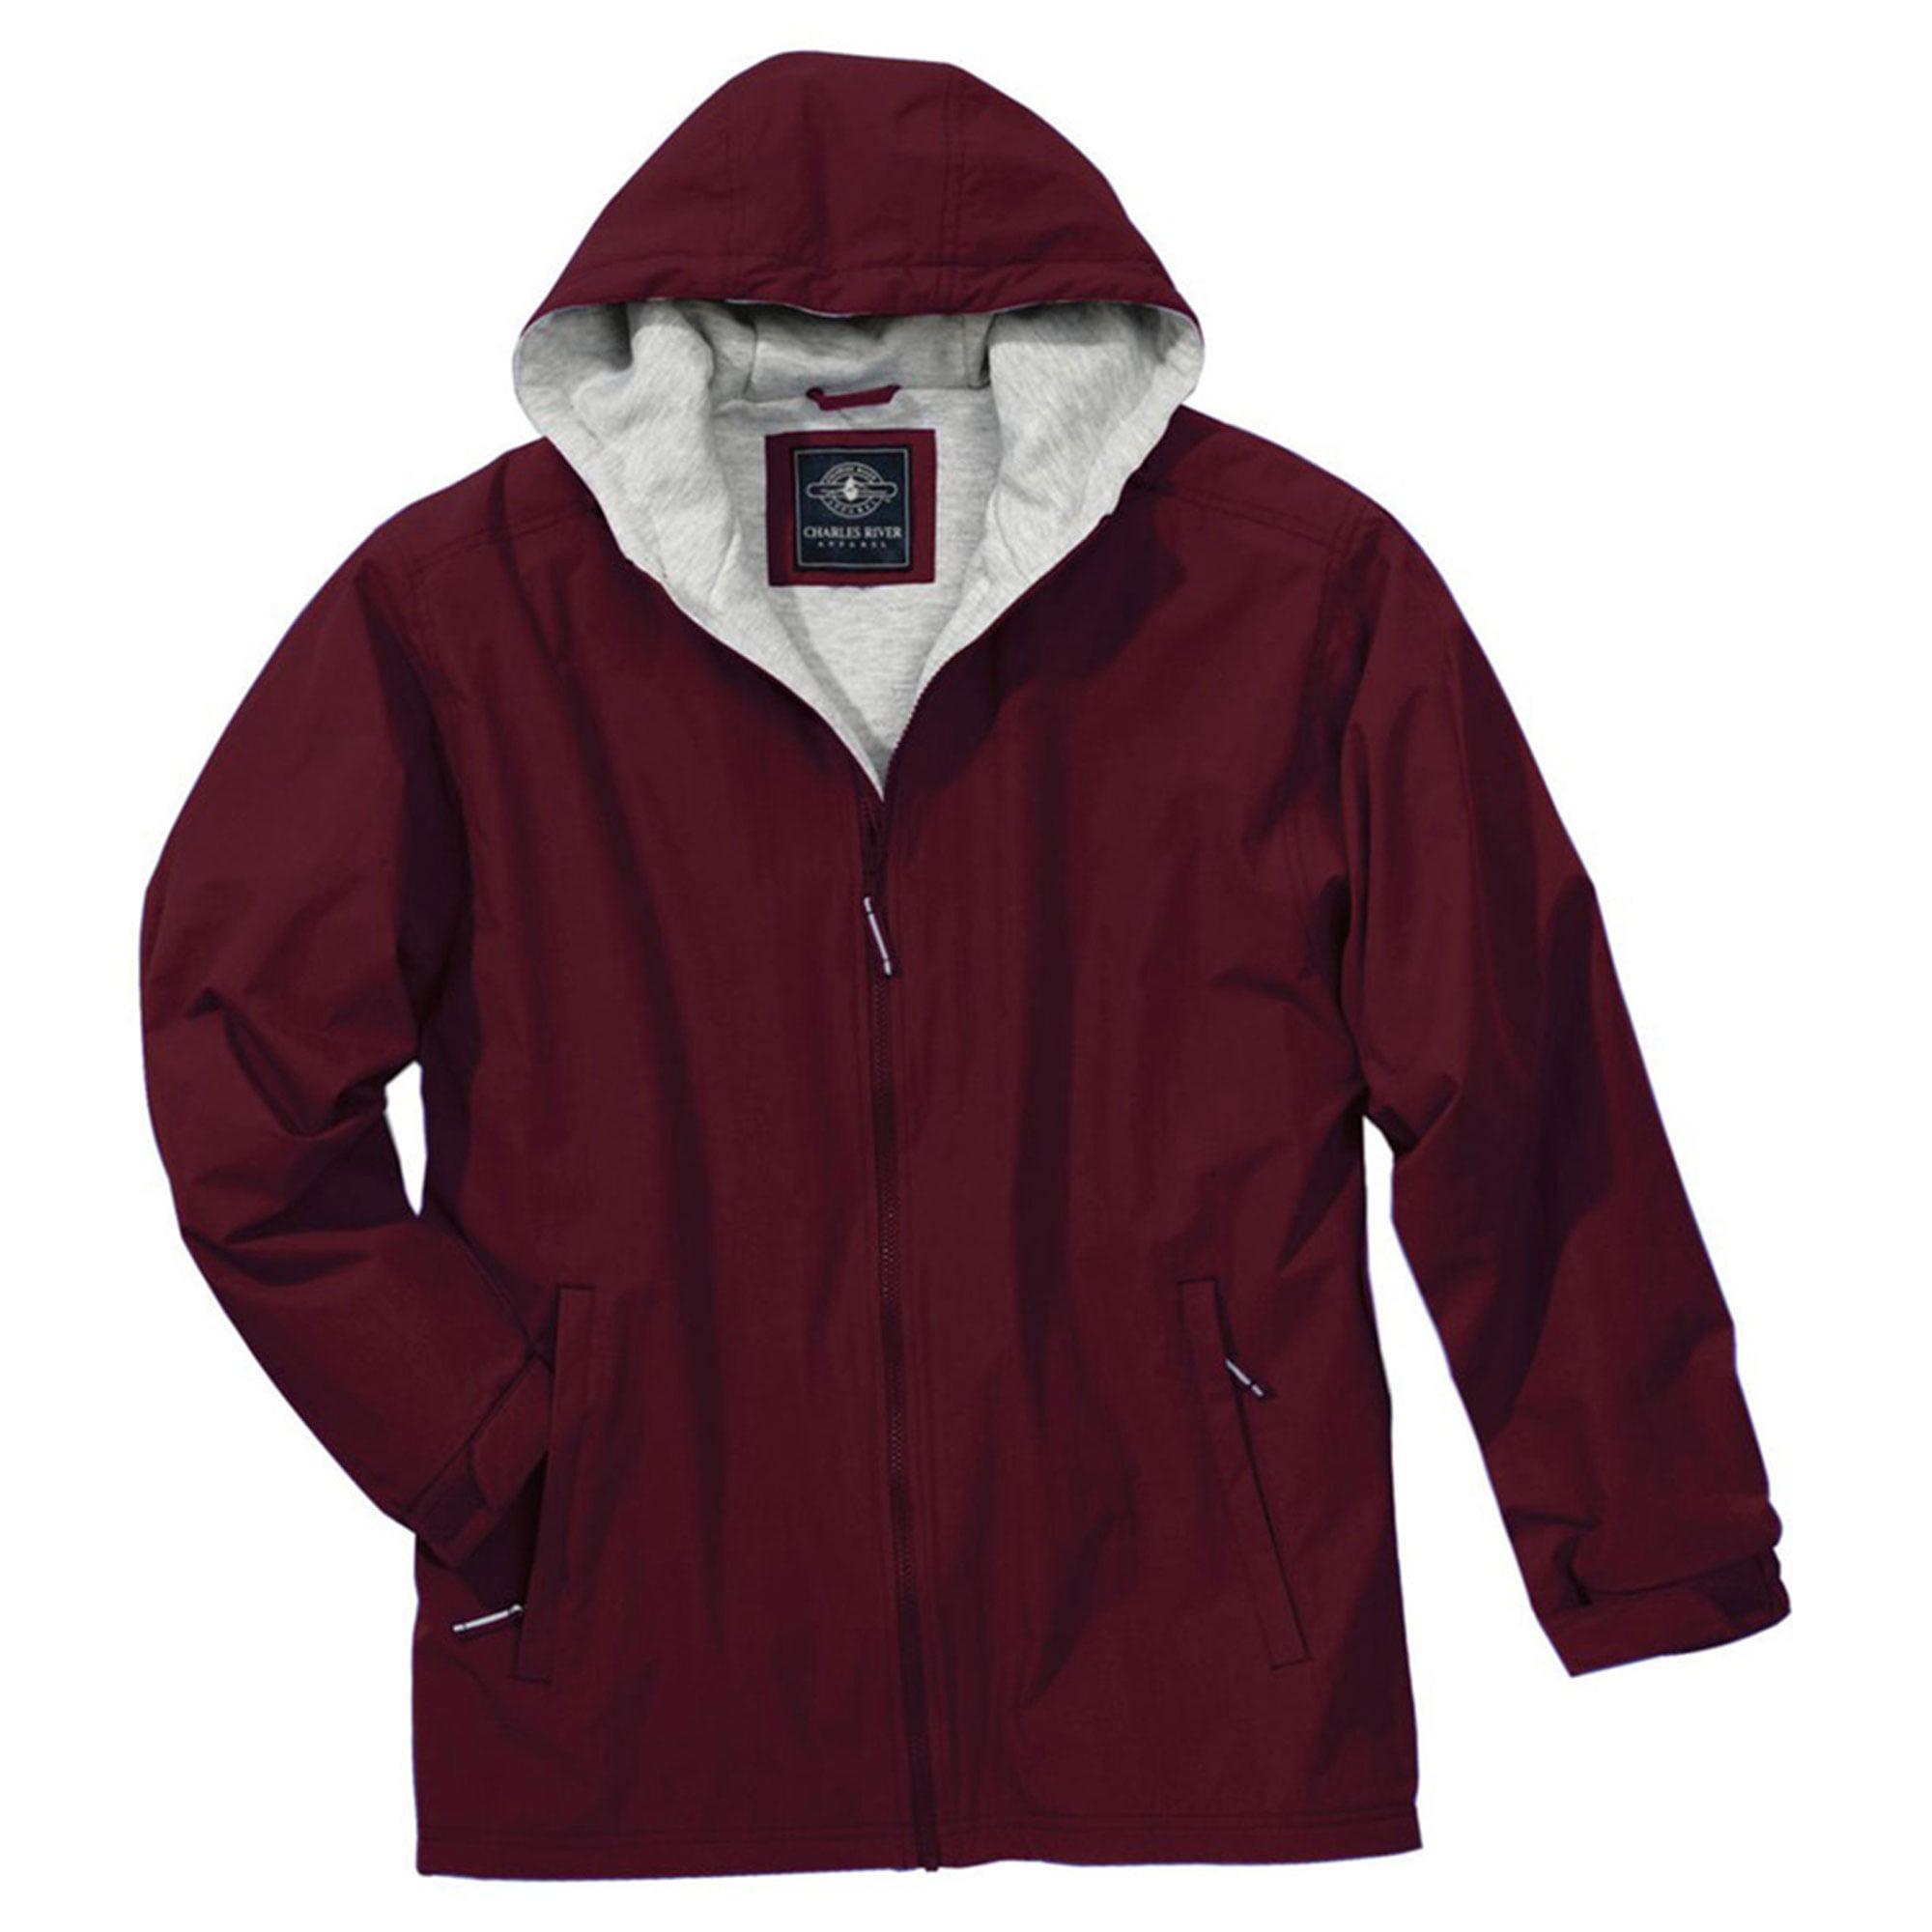 Charles River Apparel Men's Warmth Fleece Sweatshirt Jacket